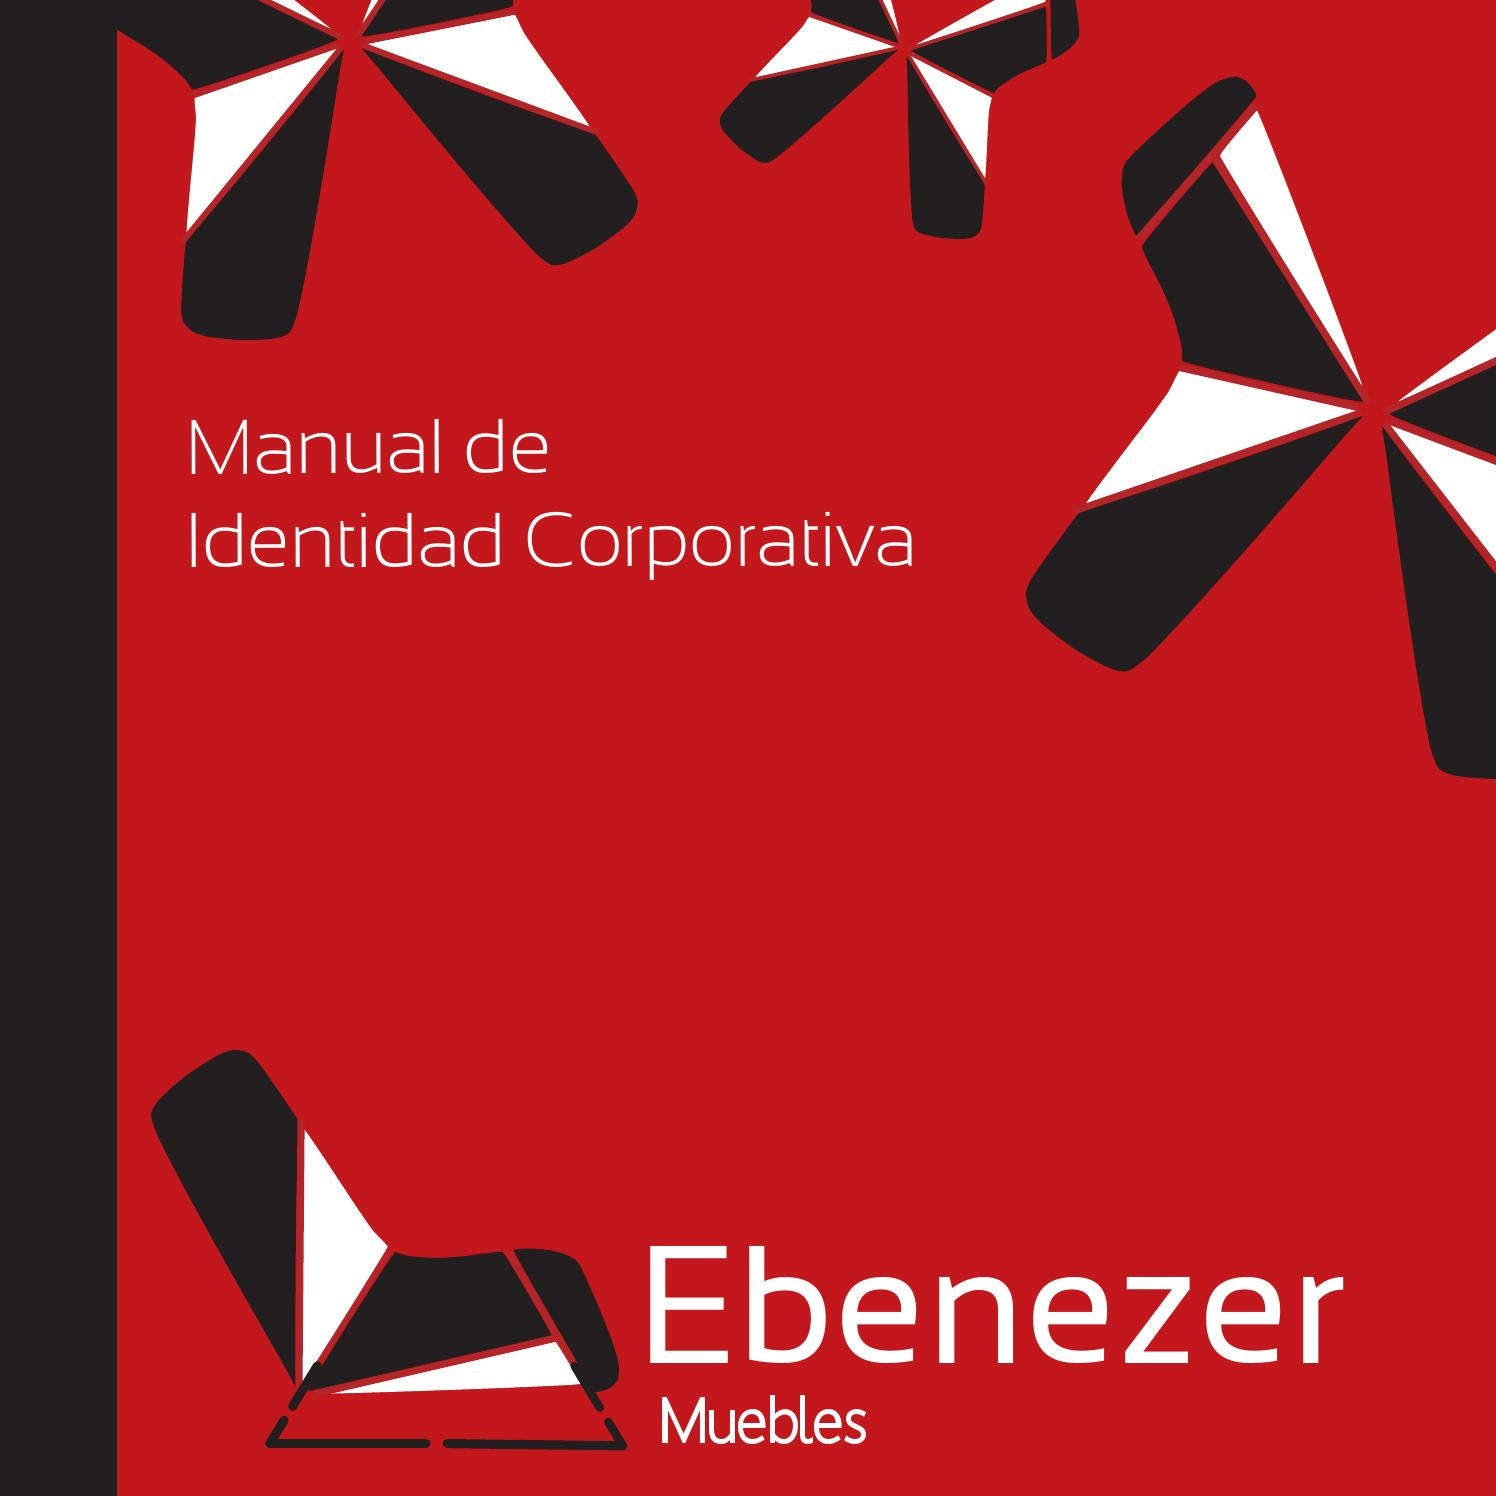 Manual De Identidad Corporativa Ebenezer Muebles By Brayco Laverde  # Muebles Ebenezer